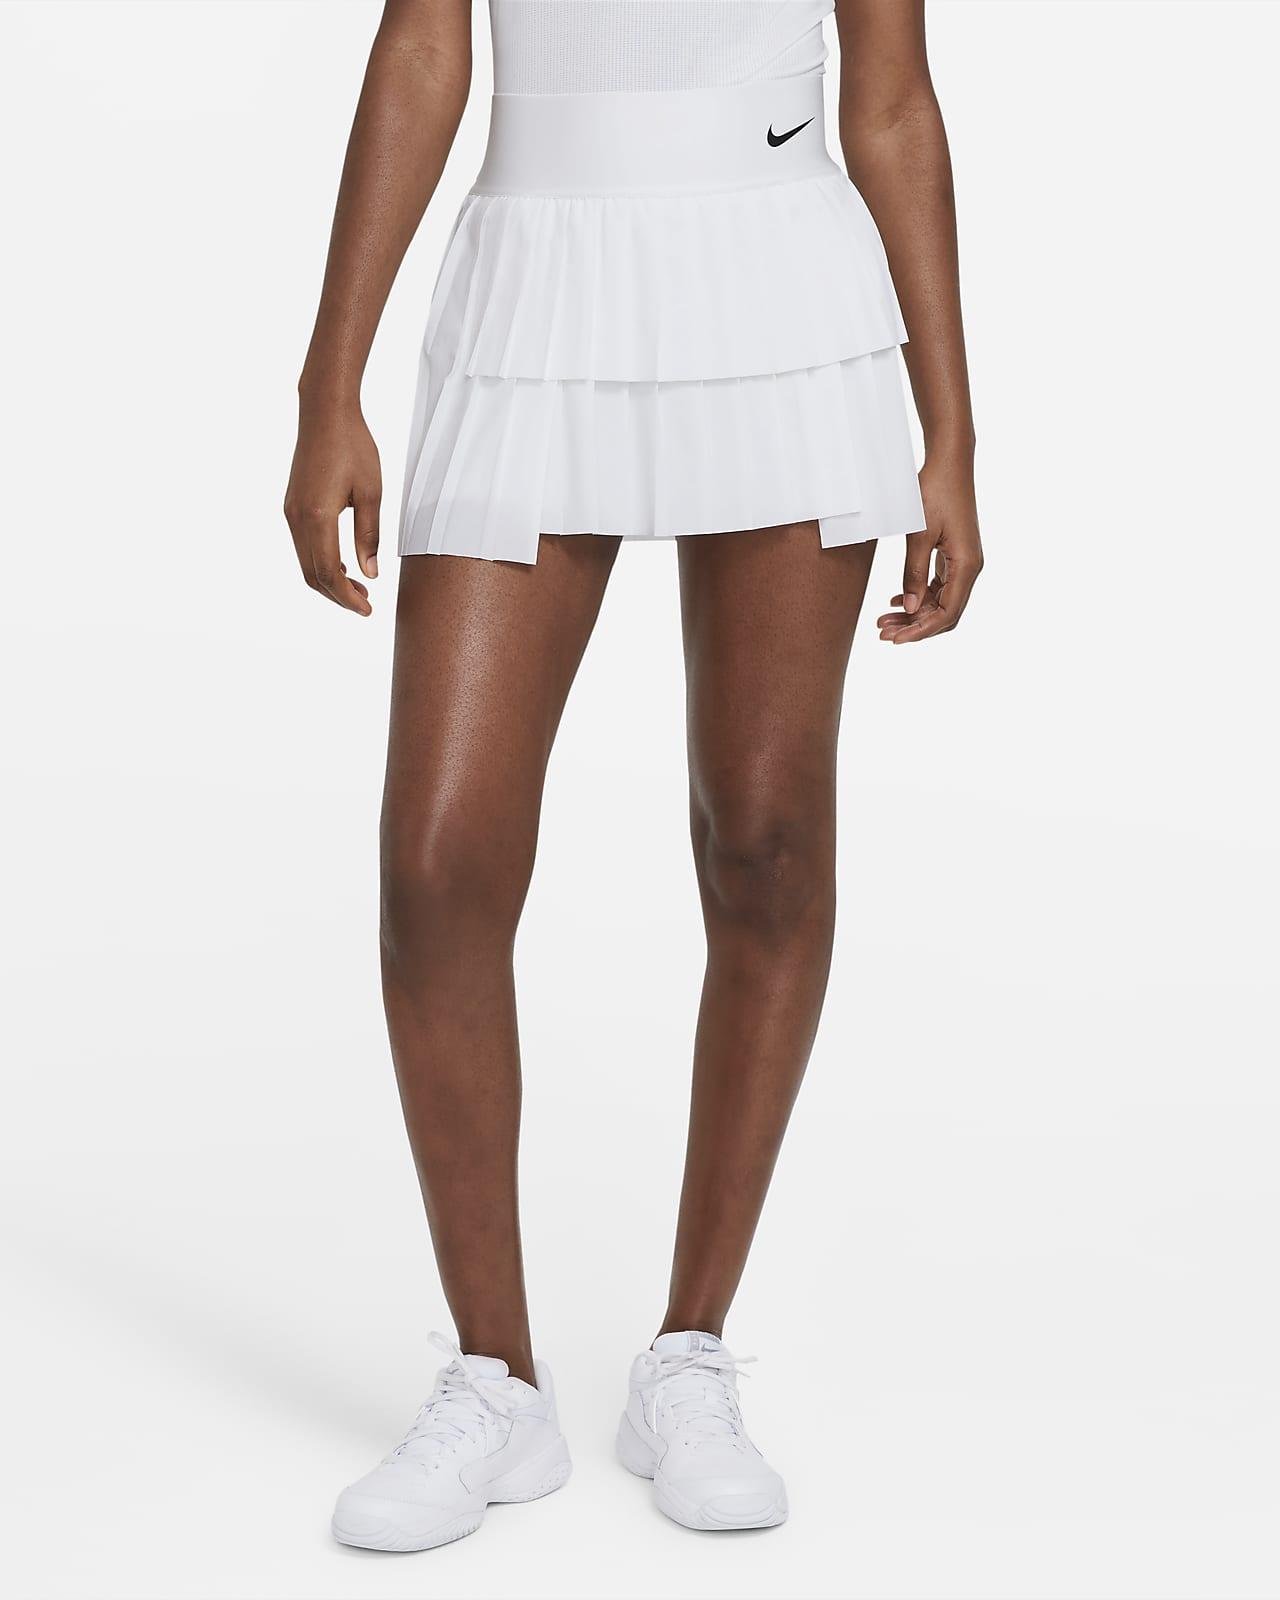 Gonna da tennis a pieghe NikeCourt Advantage - Donna